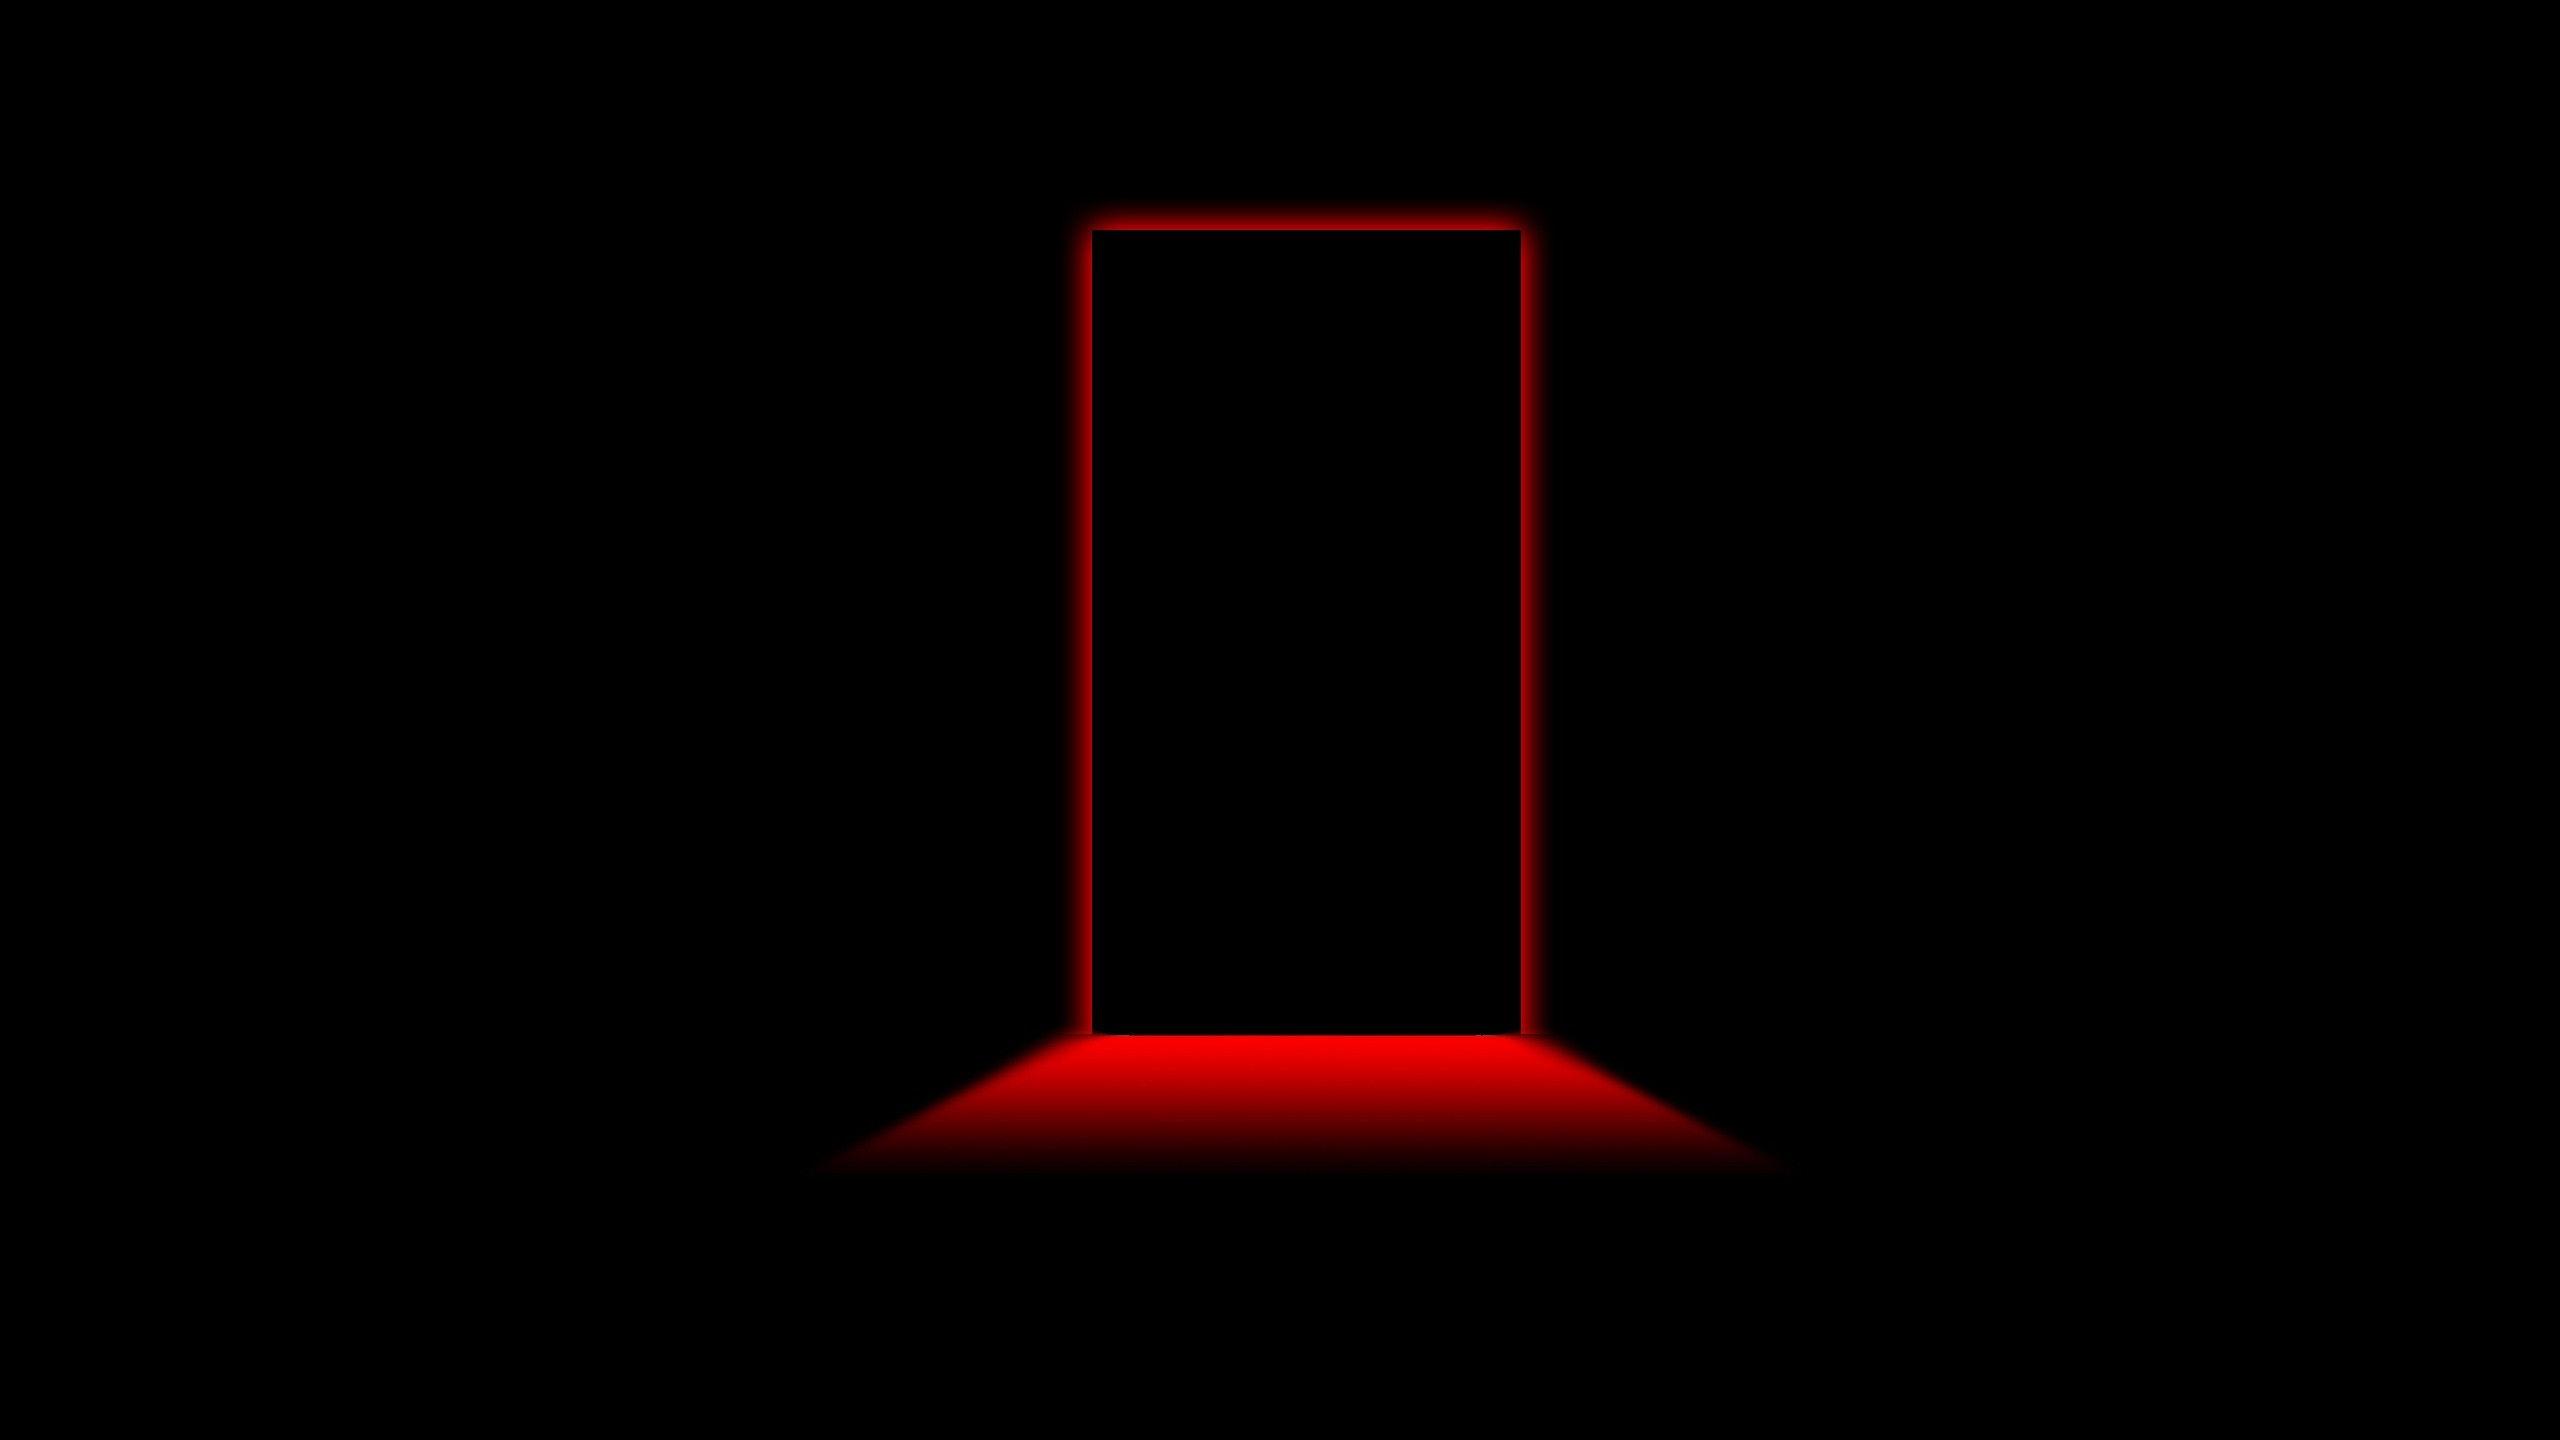 Red Wallpaper 028